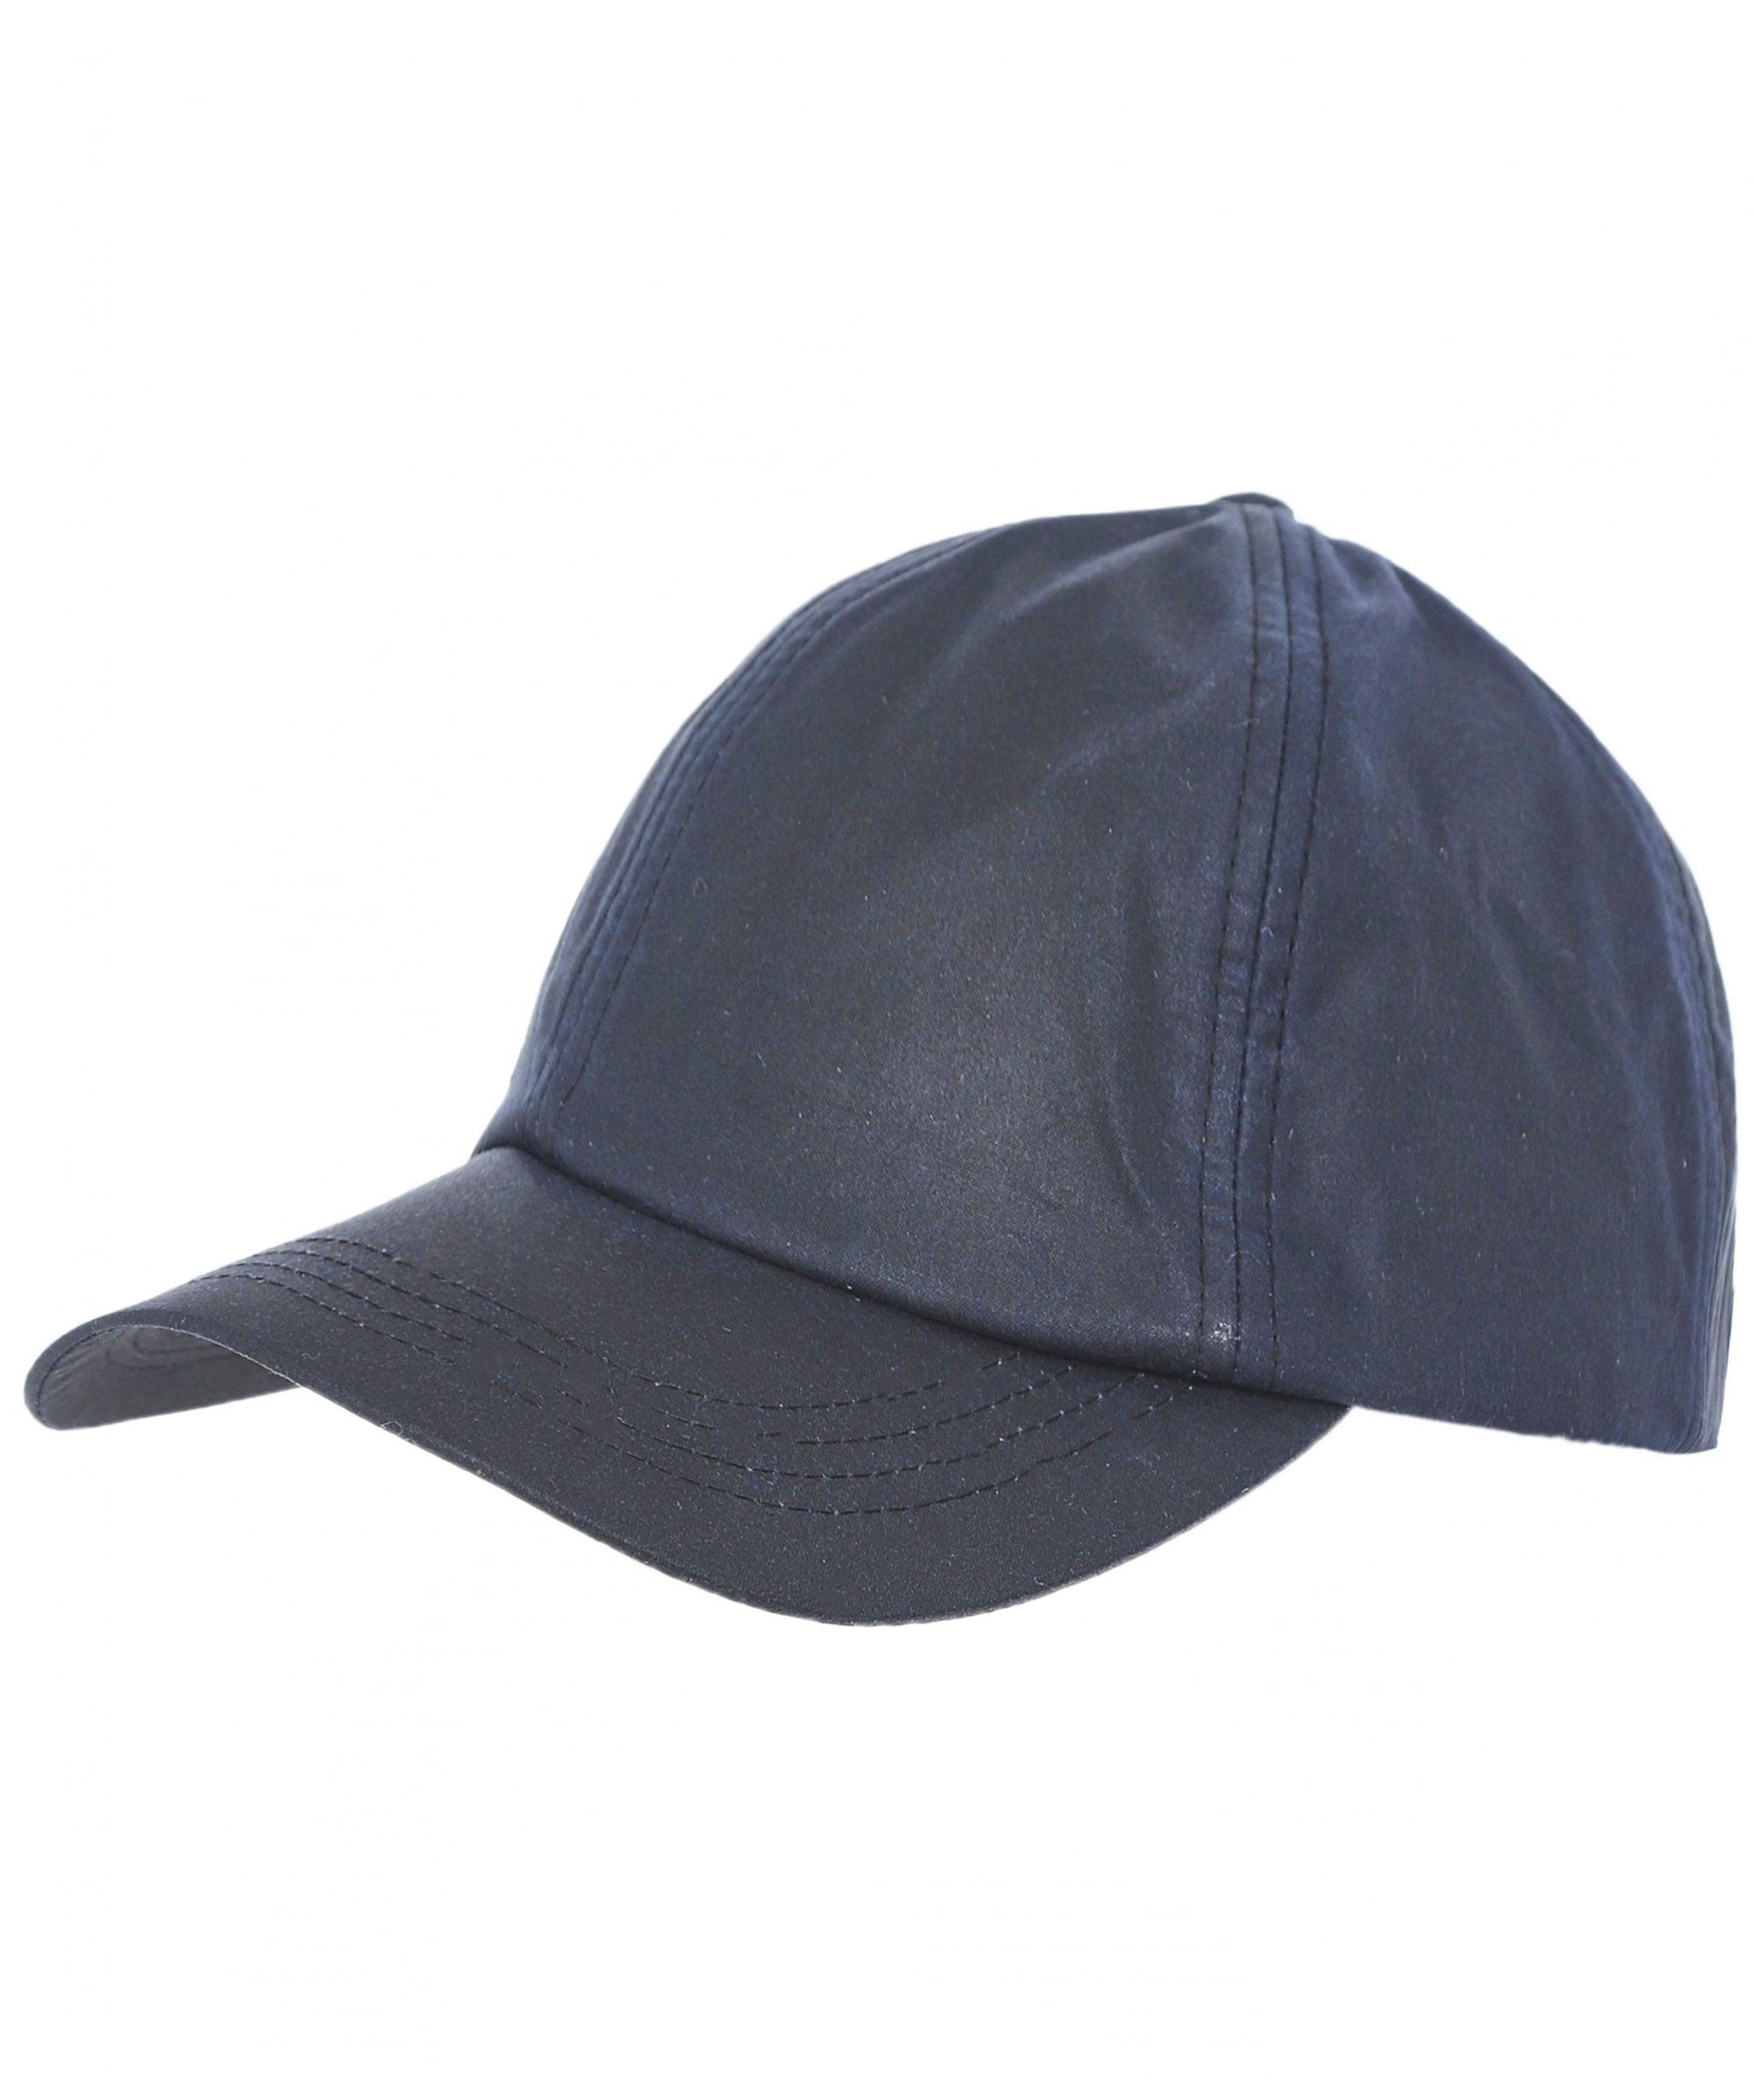 f0ed6123ae0 Barbour Wax Prestbury Sports Cap in Blue for Men - Lyst